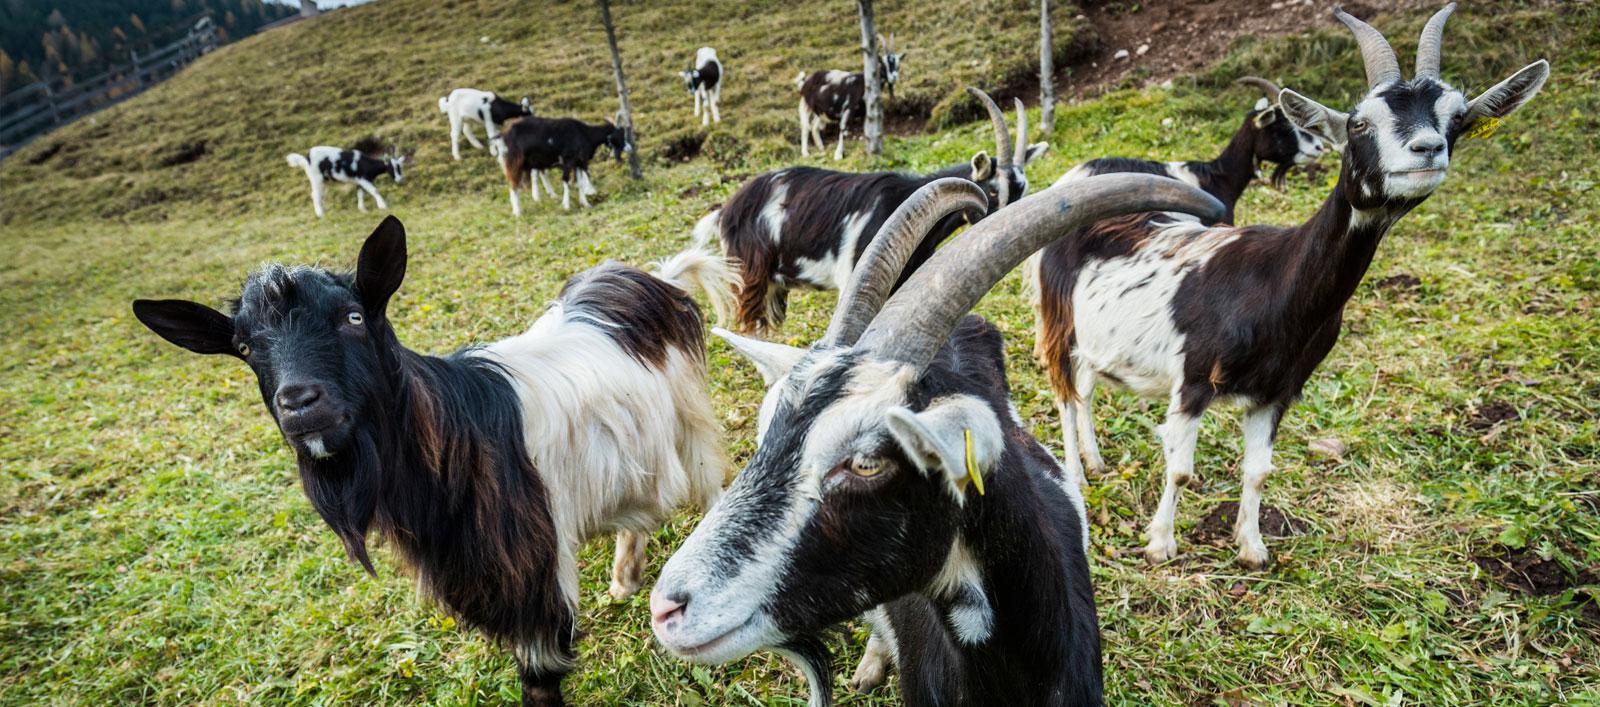 Azienda agricola biologica in Val di Fassa